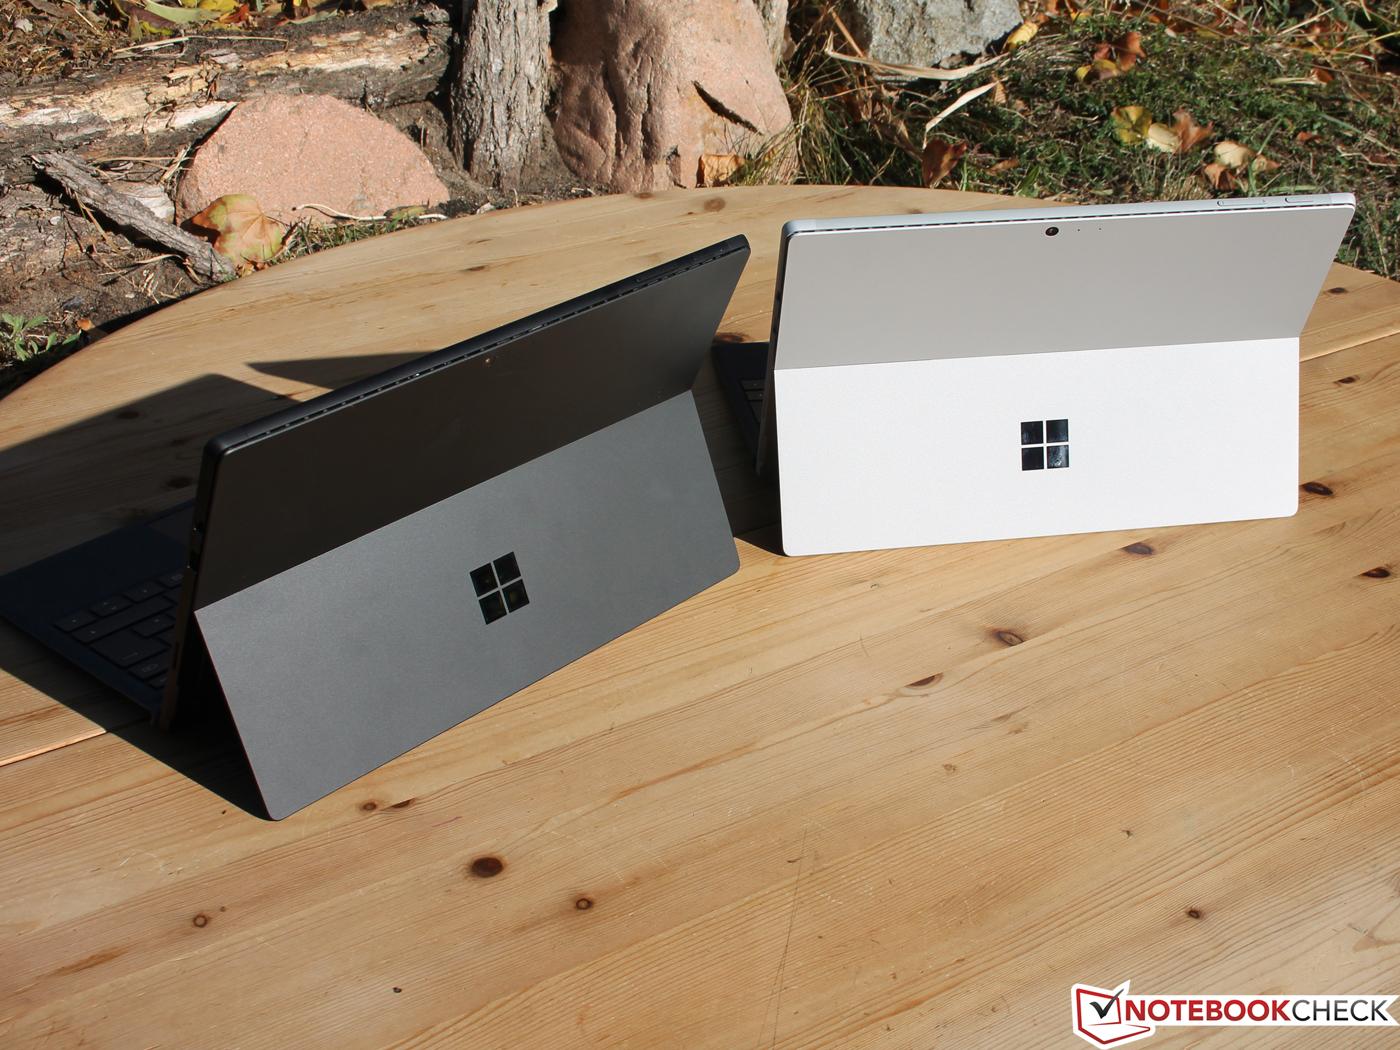 Microsoft Surface Pro 6 (2018) (i5, 128 GB, 8 GB